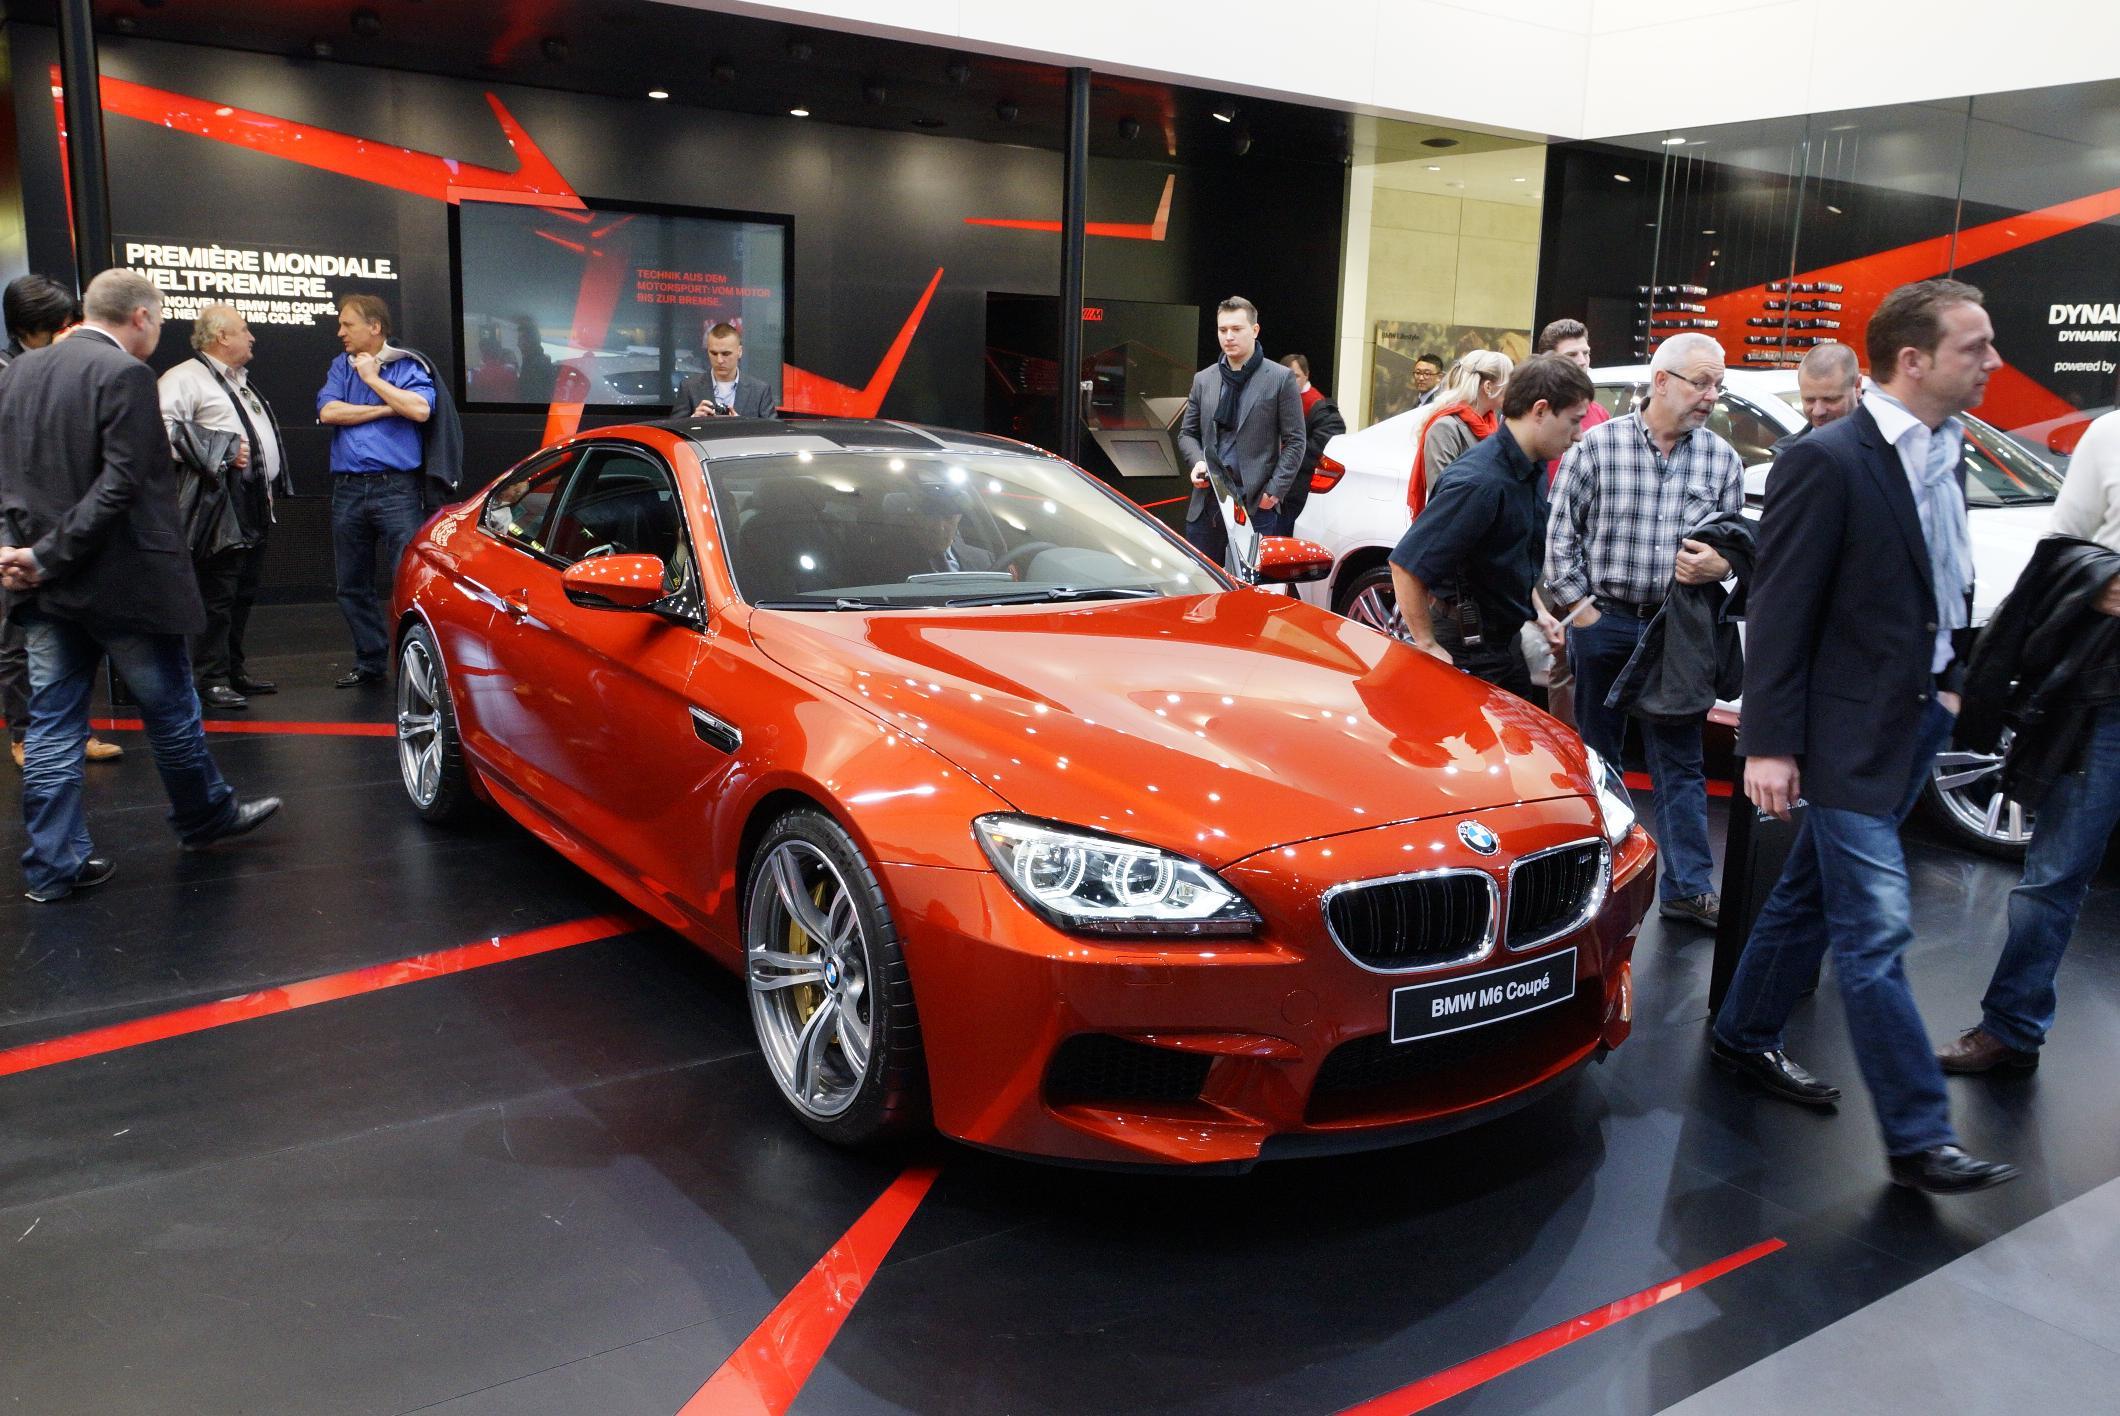 BMW M6 Geneva 2012 2